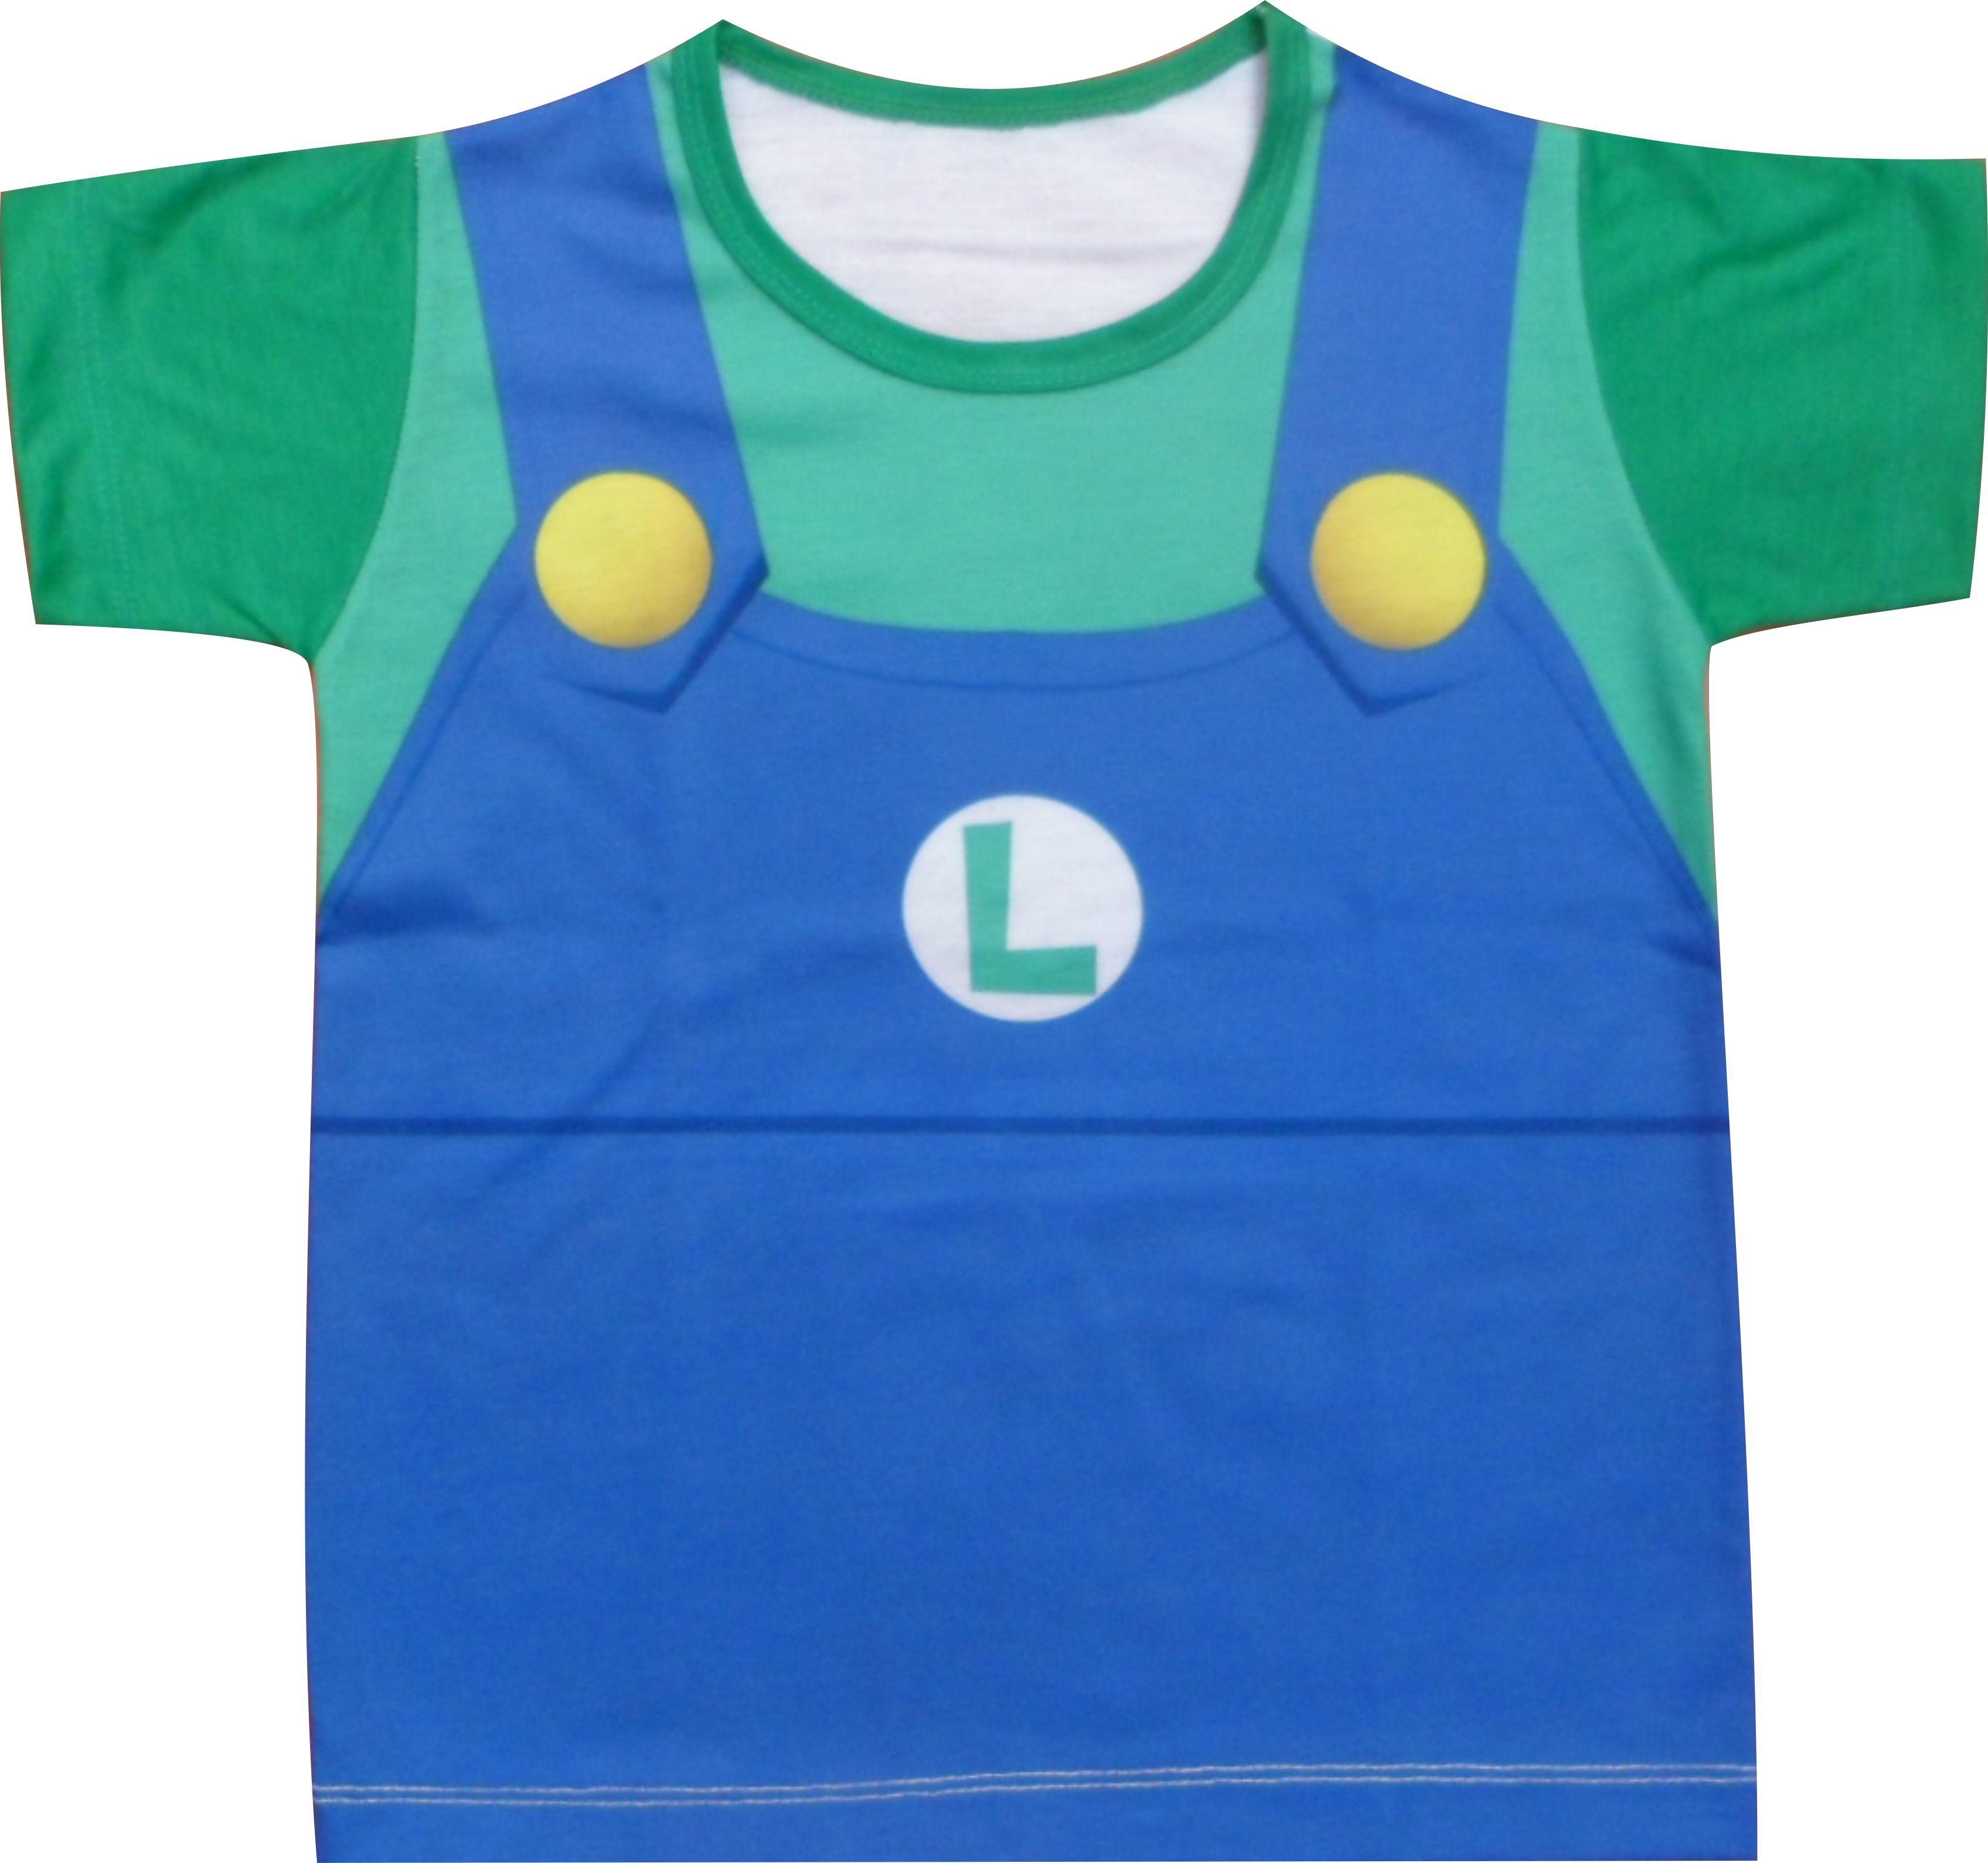 7ebefd119ad16 Camiseta infantil Luigi no Elo7